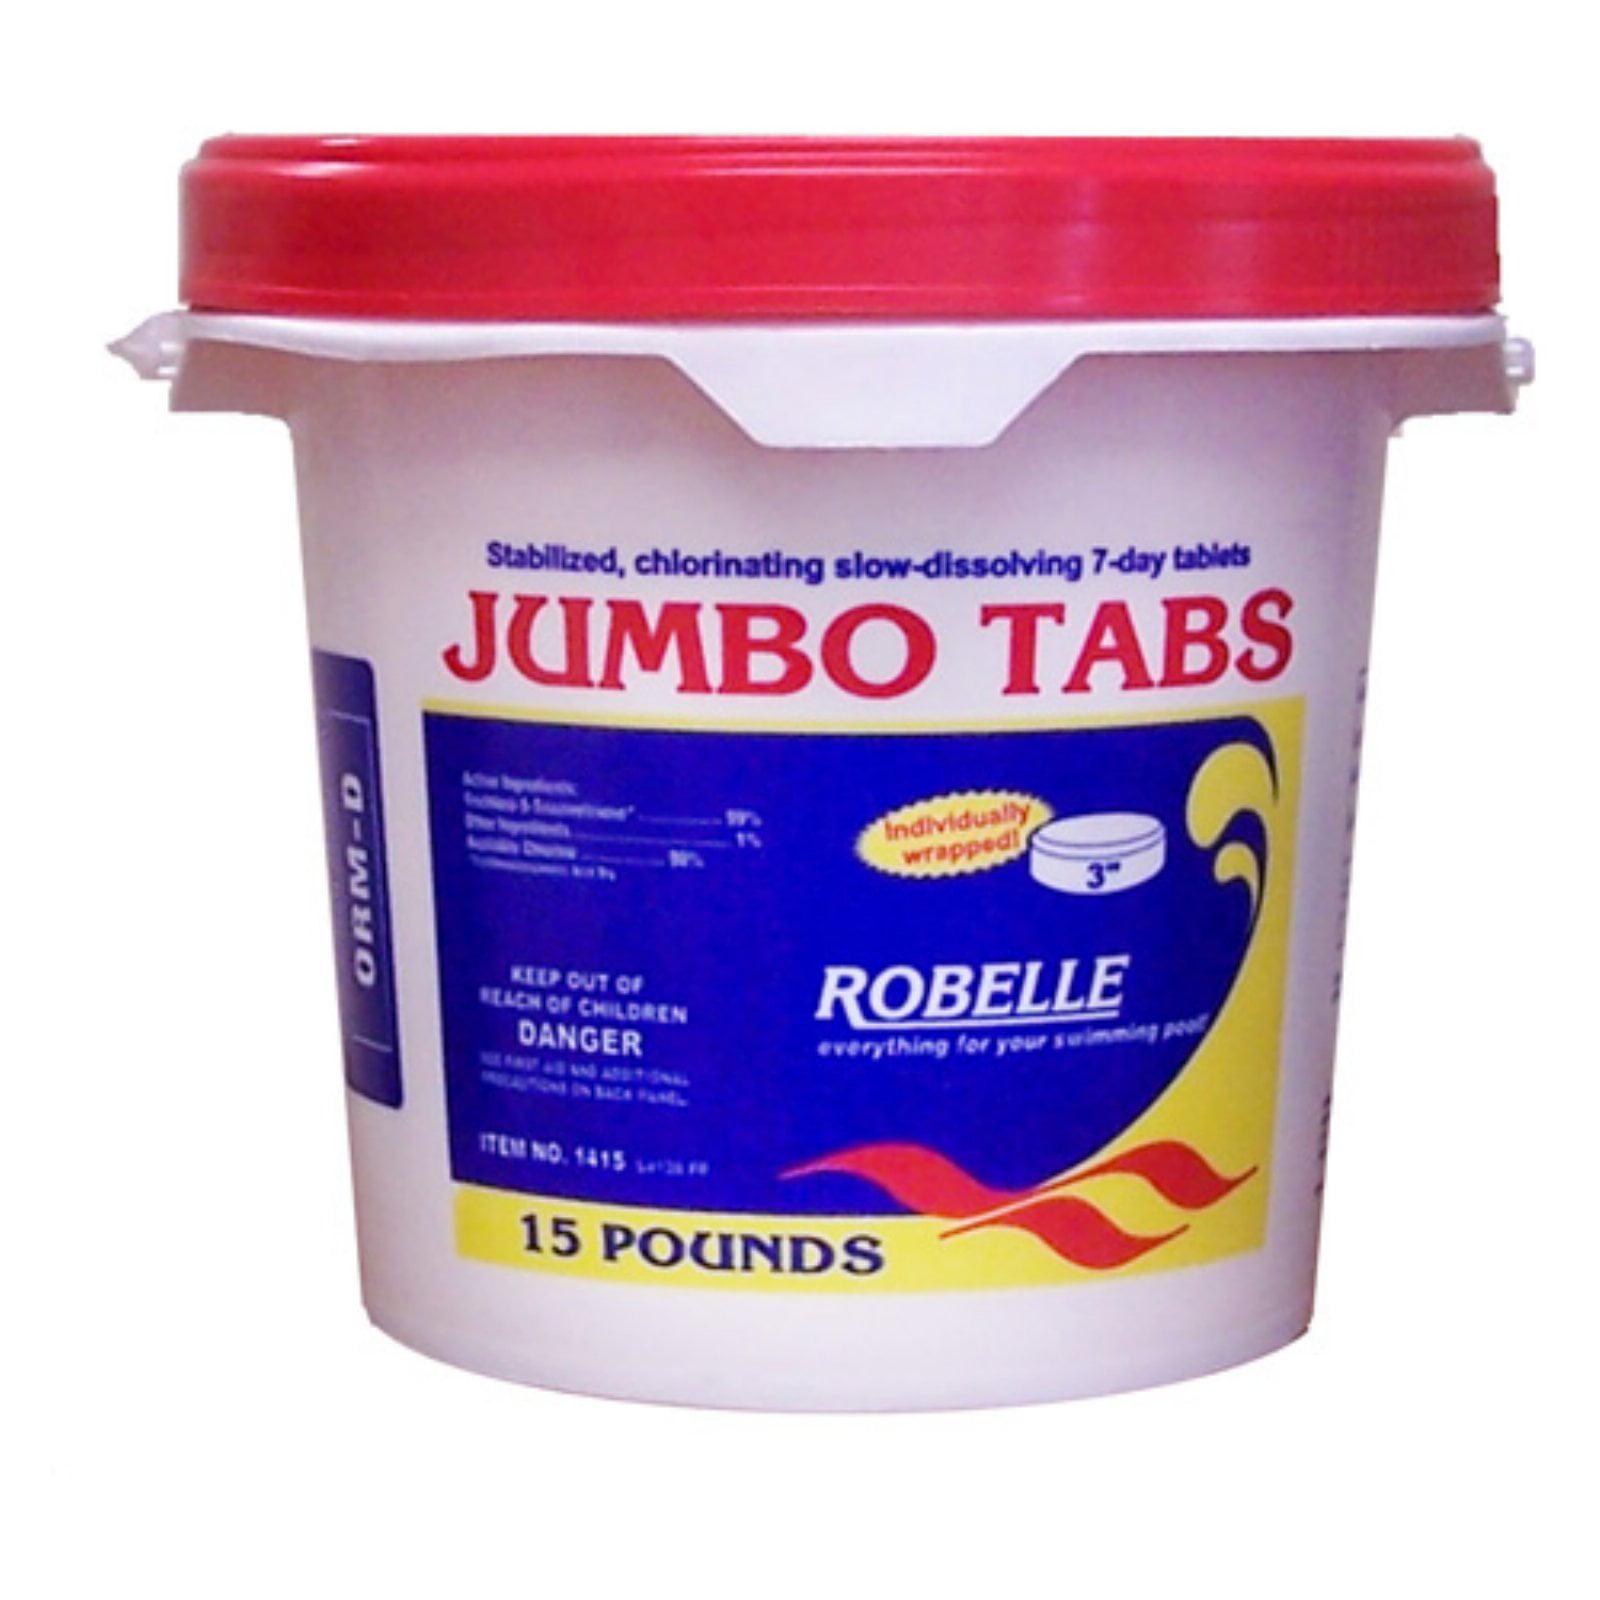 Robelle 3 in. Jumbo Chlorine Tabs